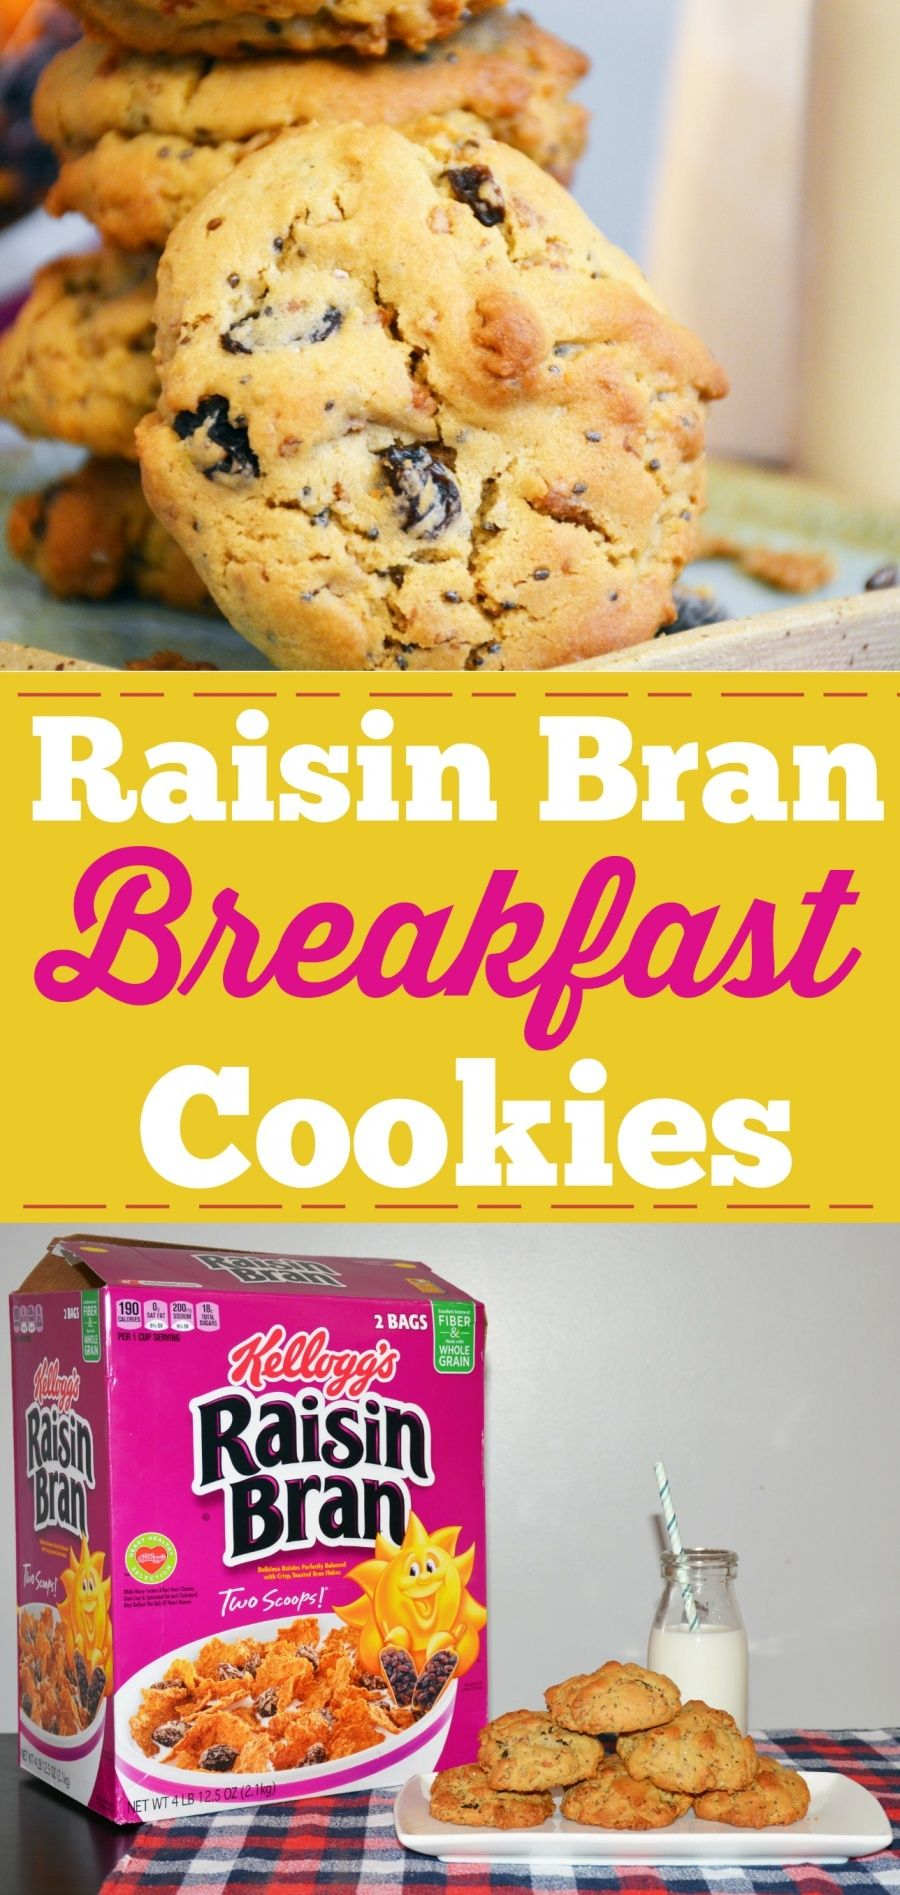 Raisin Bran Breakfast Cookies Recipe